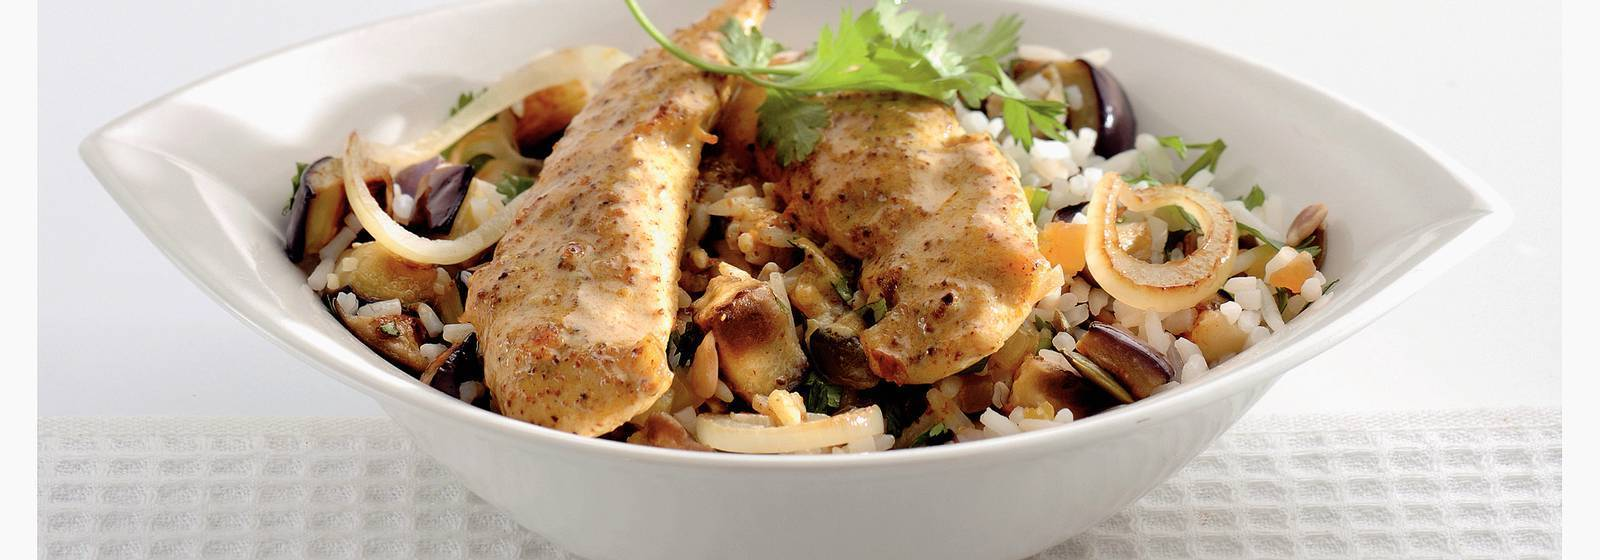 Patlıcan pilavlı tavuk köri